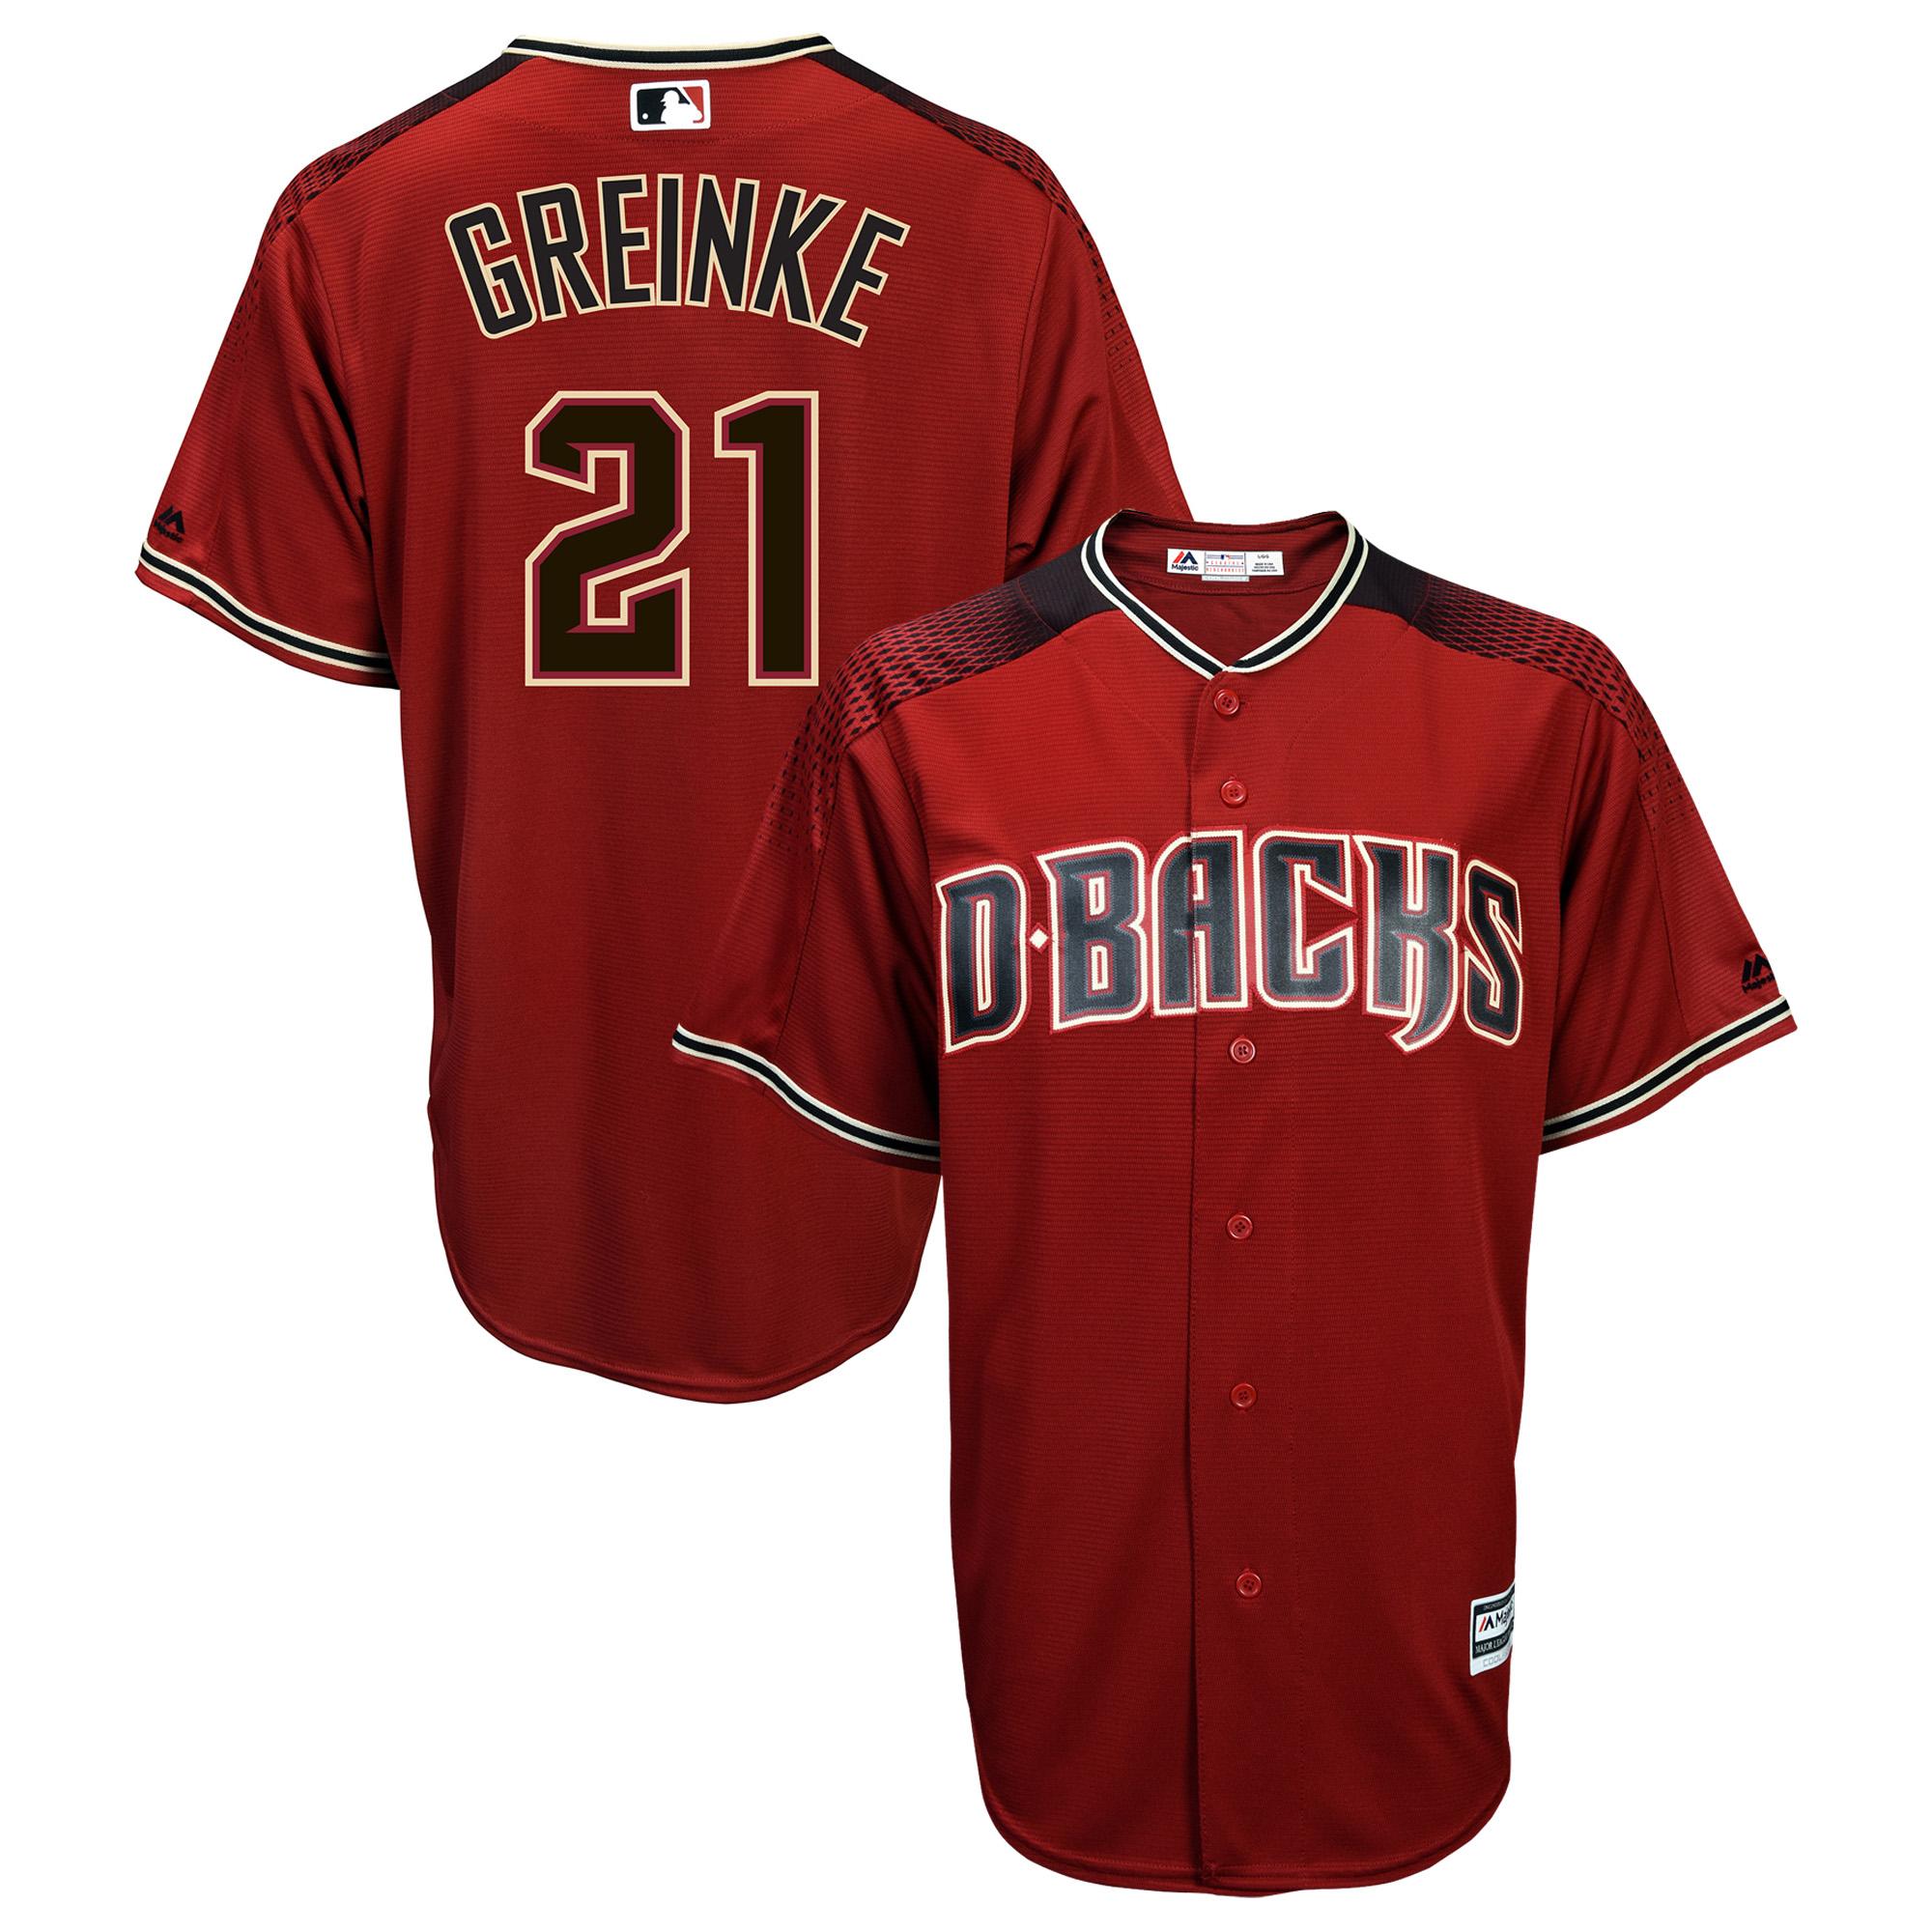 Zack Greinke Arizona Diamondbacks Majestic Official Cool Base Player Jersey - Sedona Red/Black